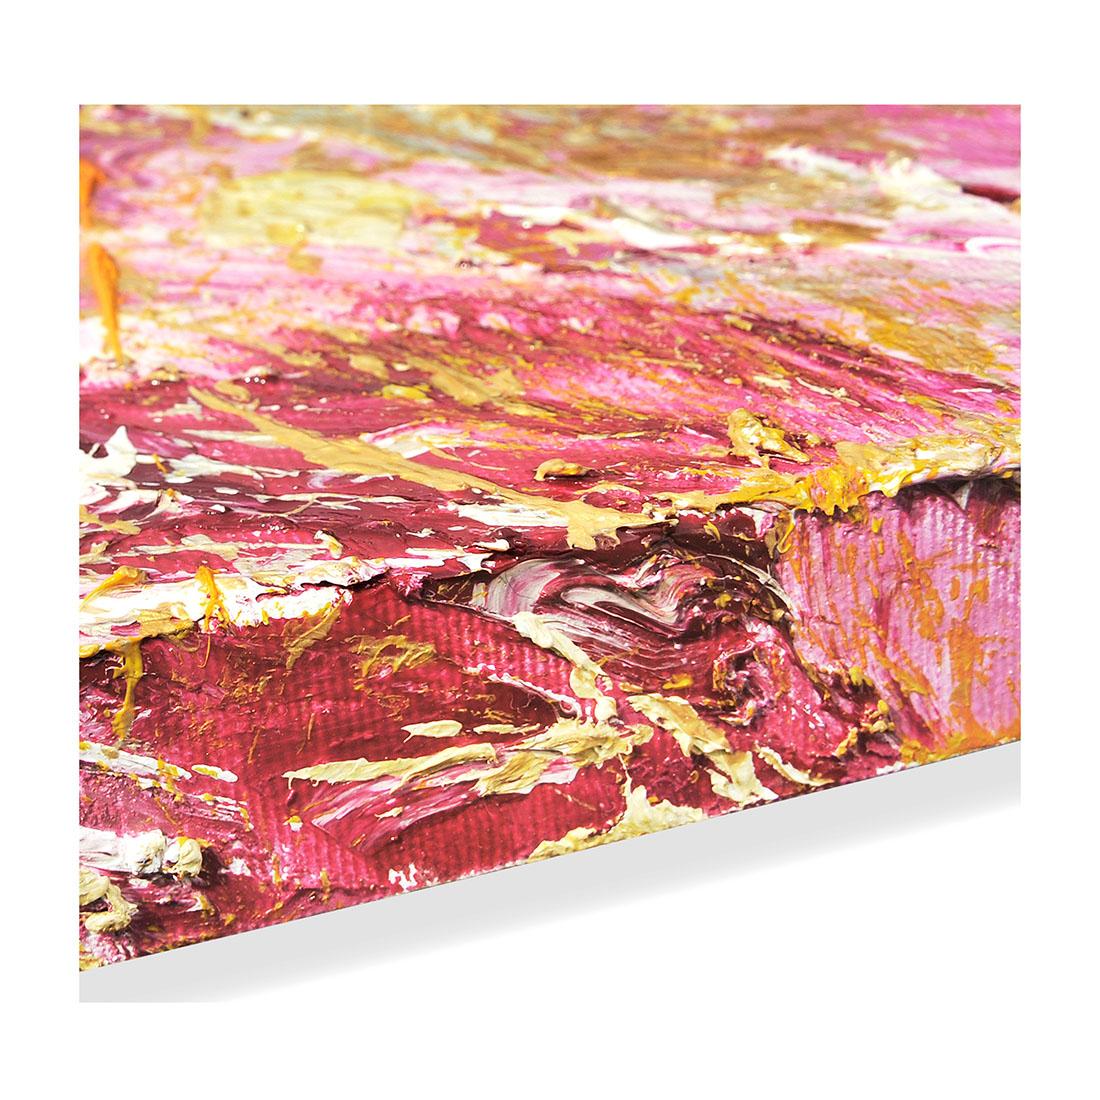 Soffio-100x70---Acrilico-su-tela---2014-C